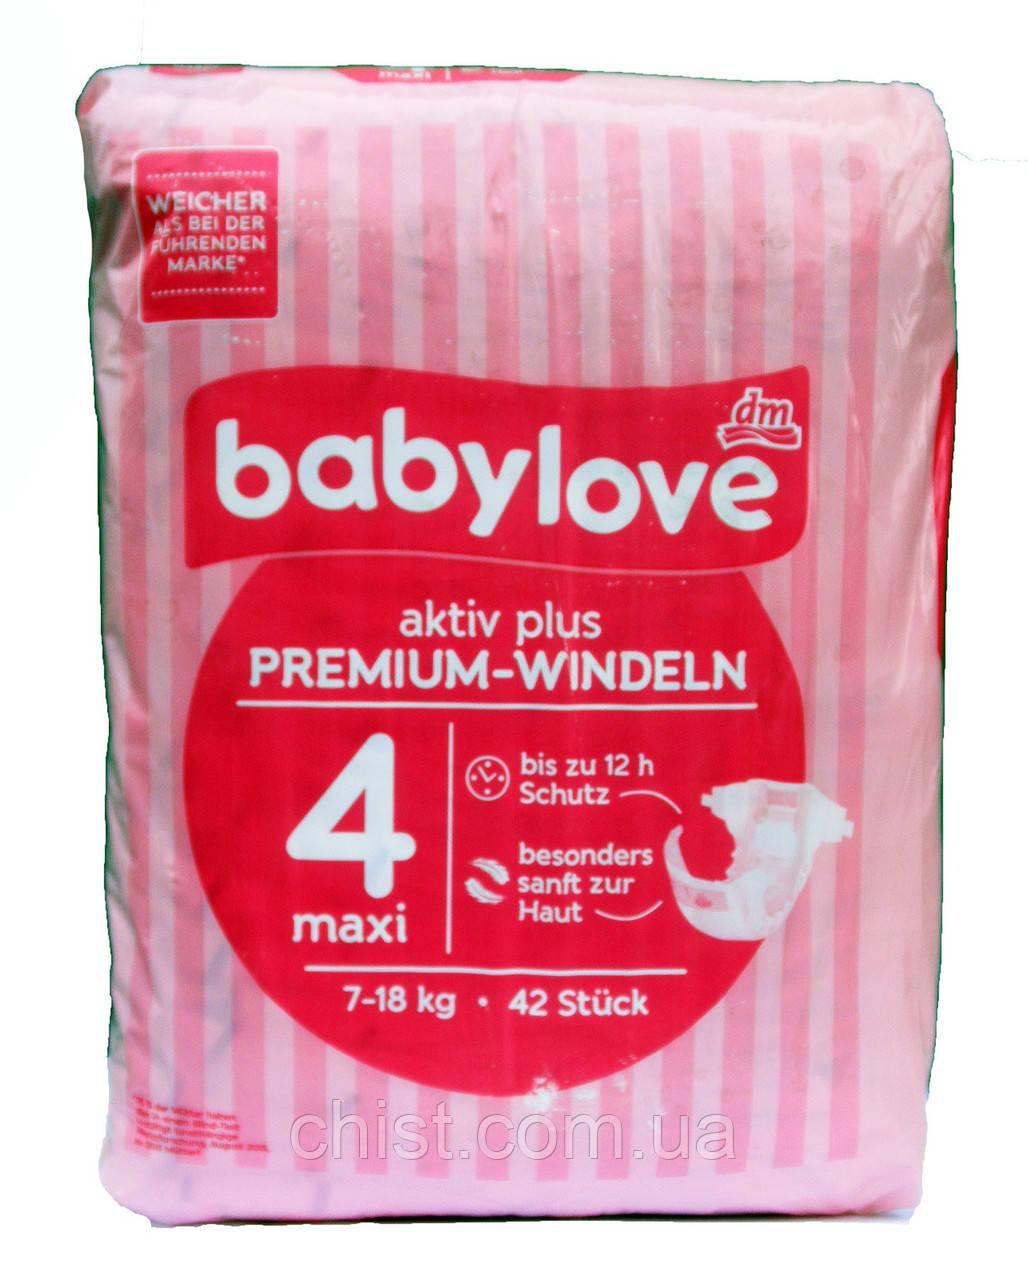 Babylove aktiv plus 4 maxi Памперсы 7-18 кг ( 42 шт)